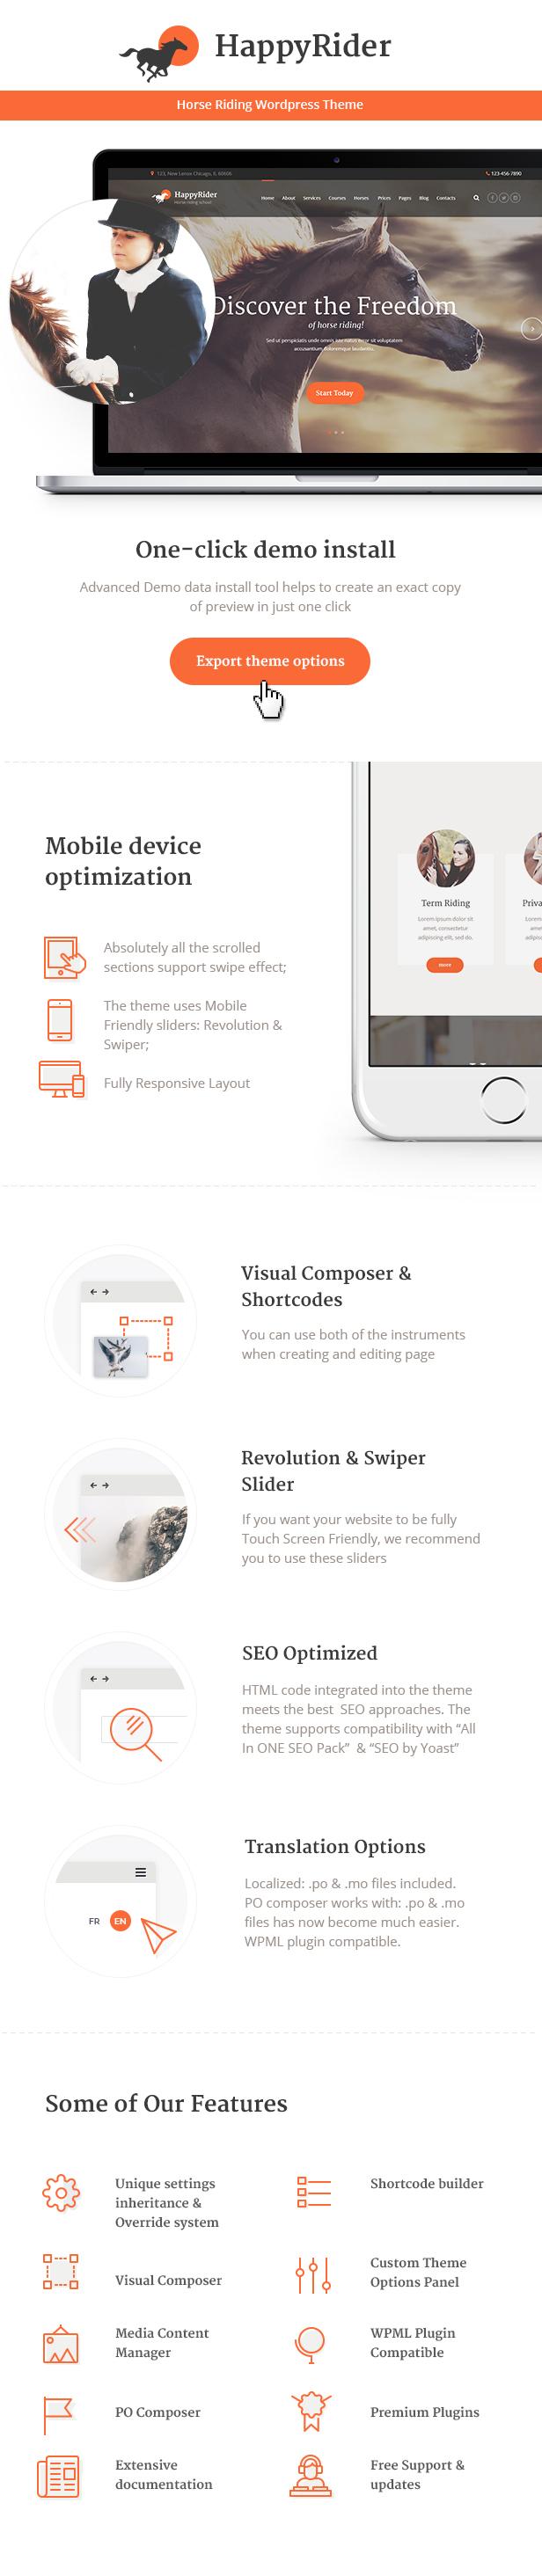 Rider - Horse School & Equestrian Center WordPress Theme features